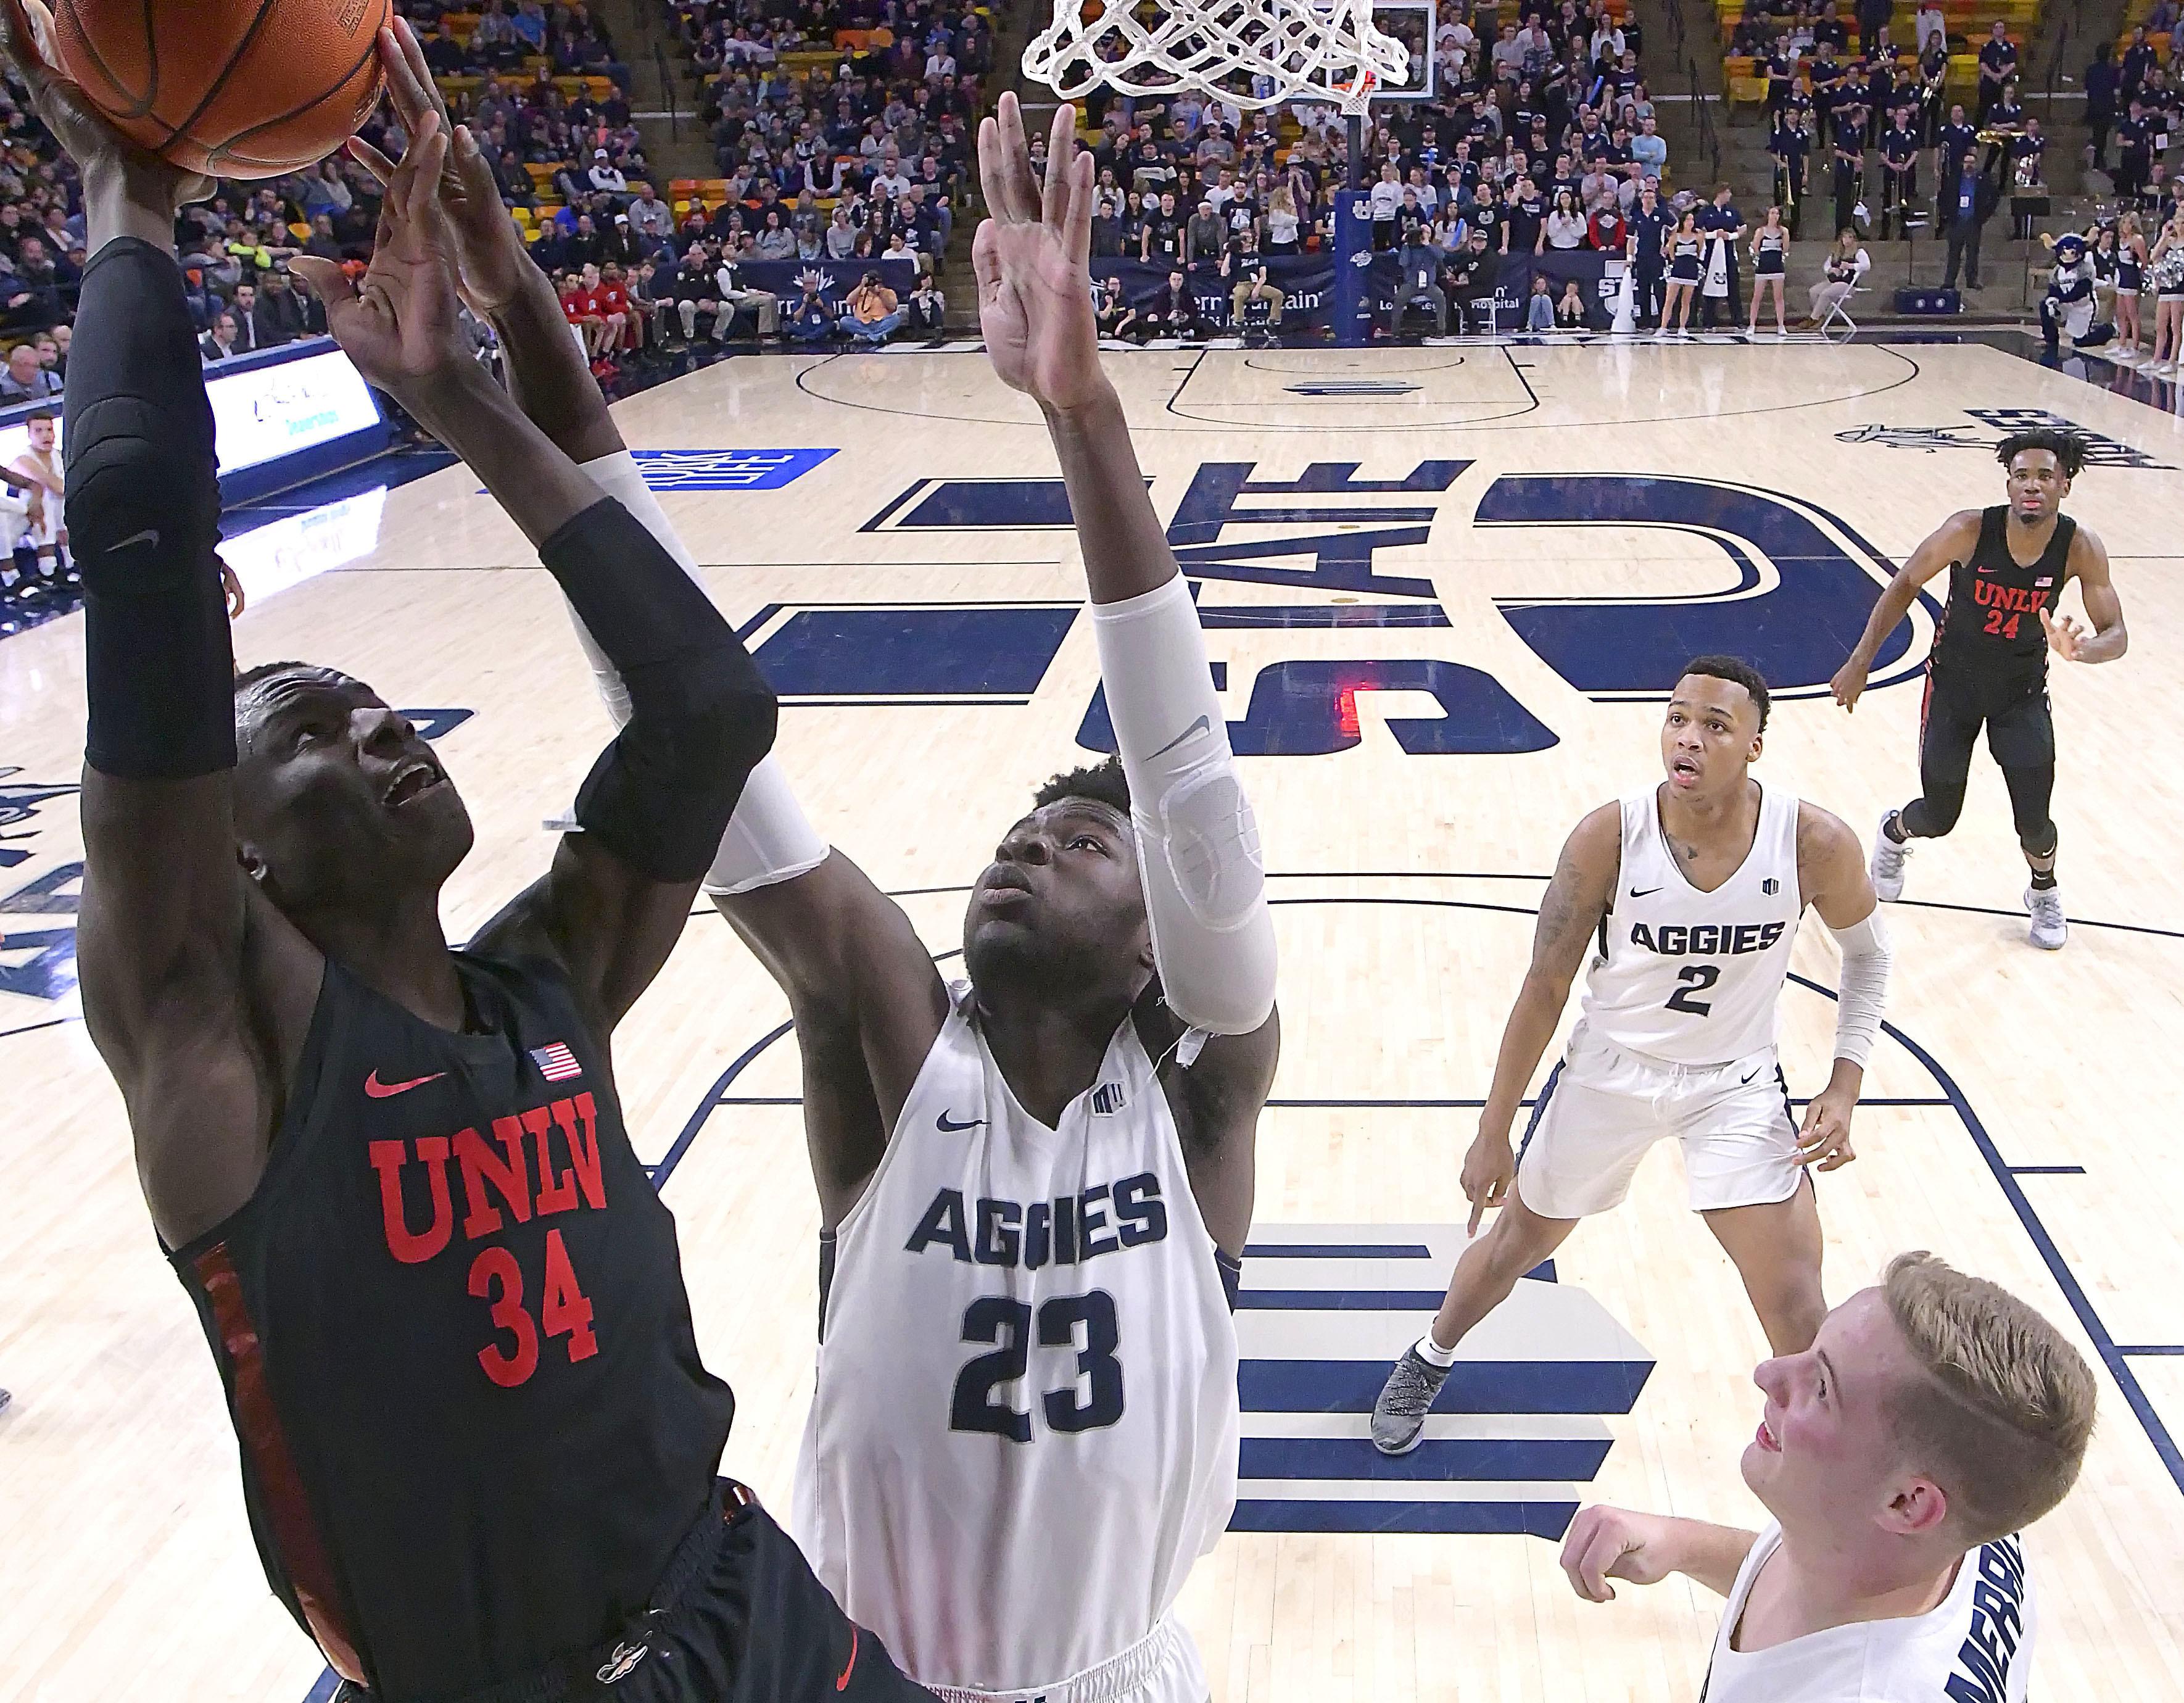 buy online 8b233 1323f USU men's basketball: Aggies batter UNLV Rebels for sixth ...